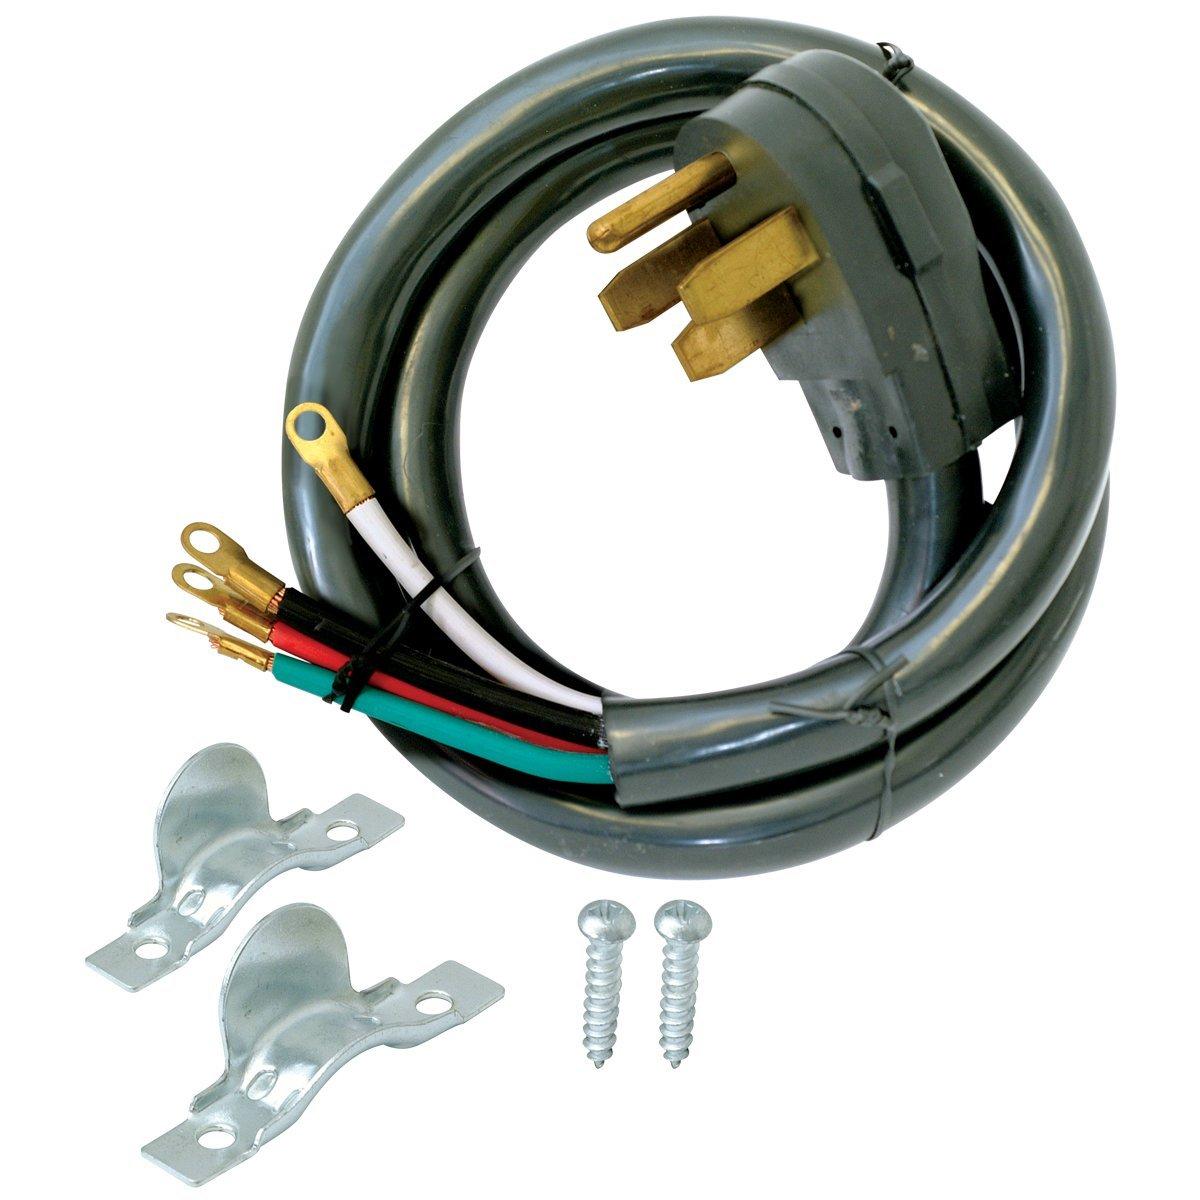 EZ-FLO 61248 4-Prong Range Cord - 50 Amp